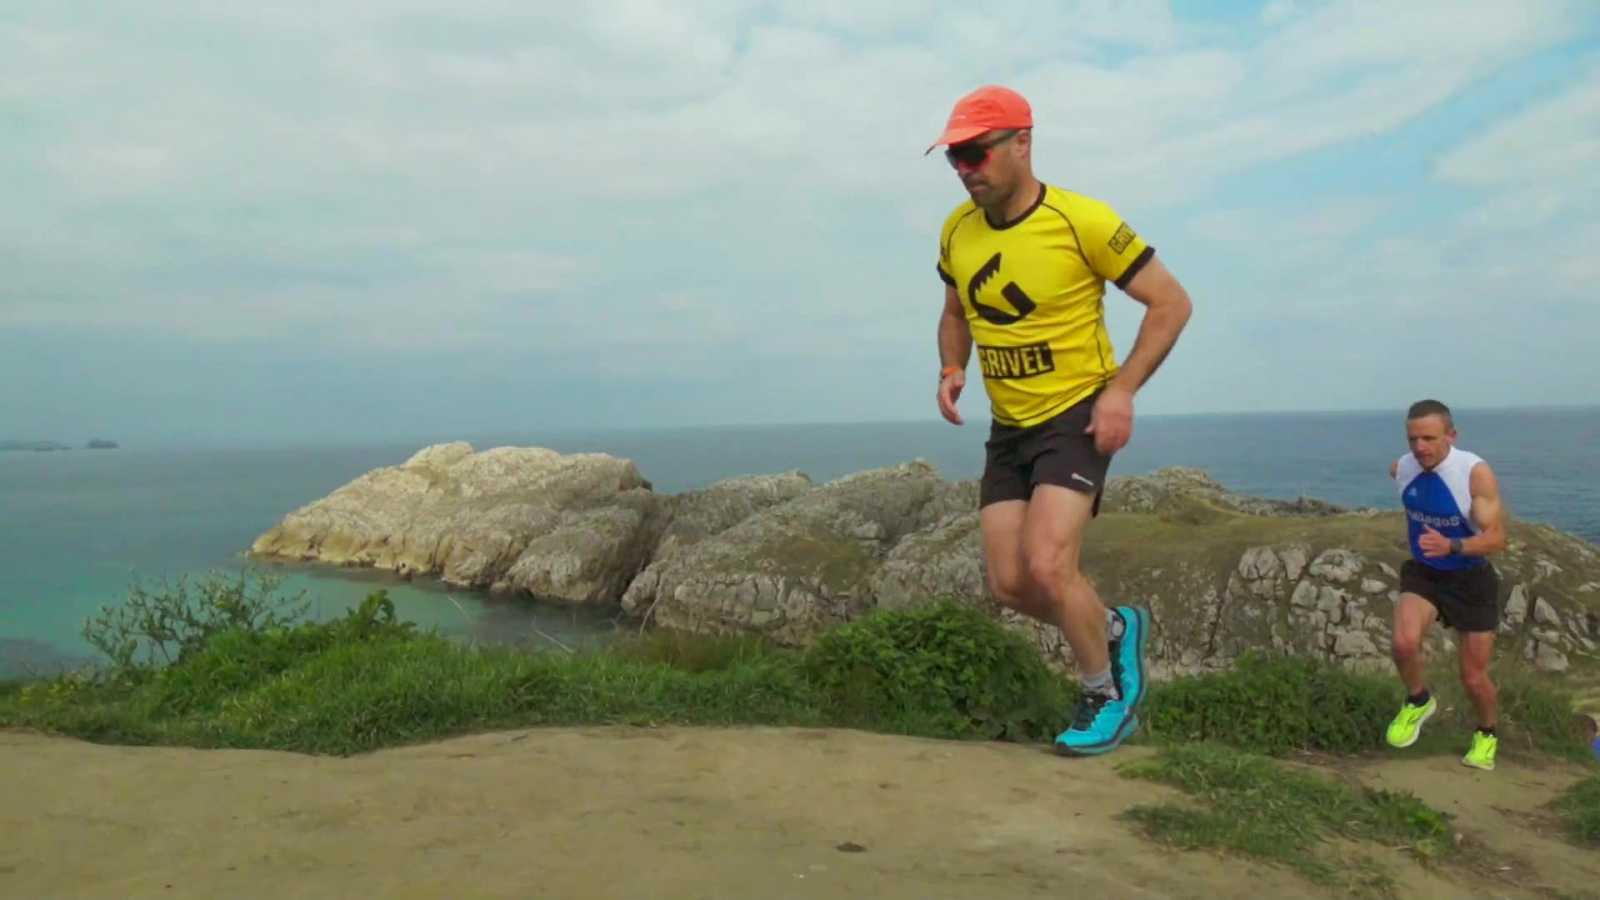 Atletismo - Campeonato de España carreras de montaña. Trail Running - ver ahora